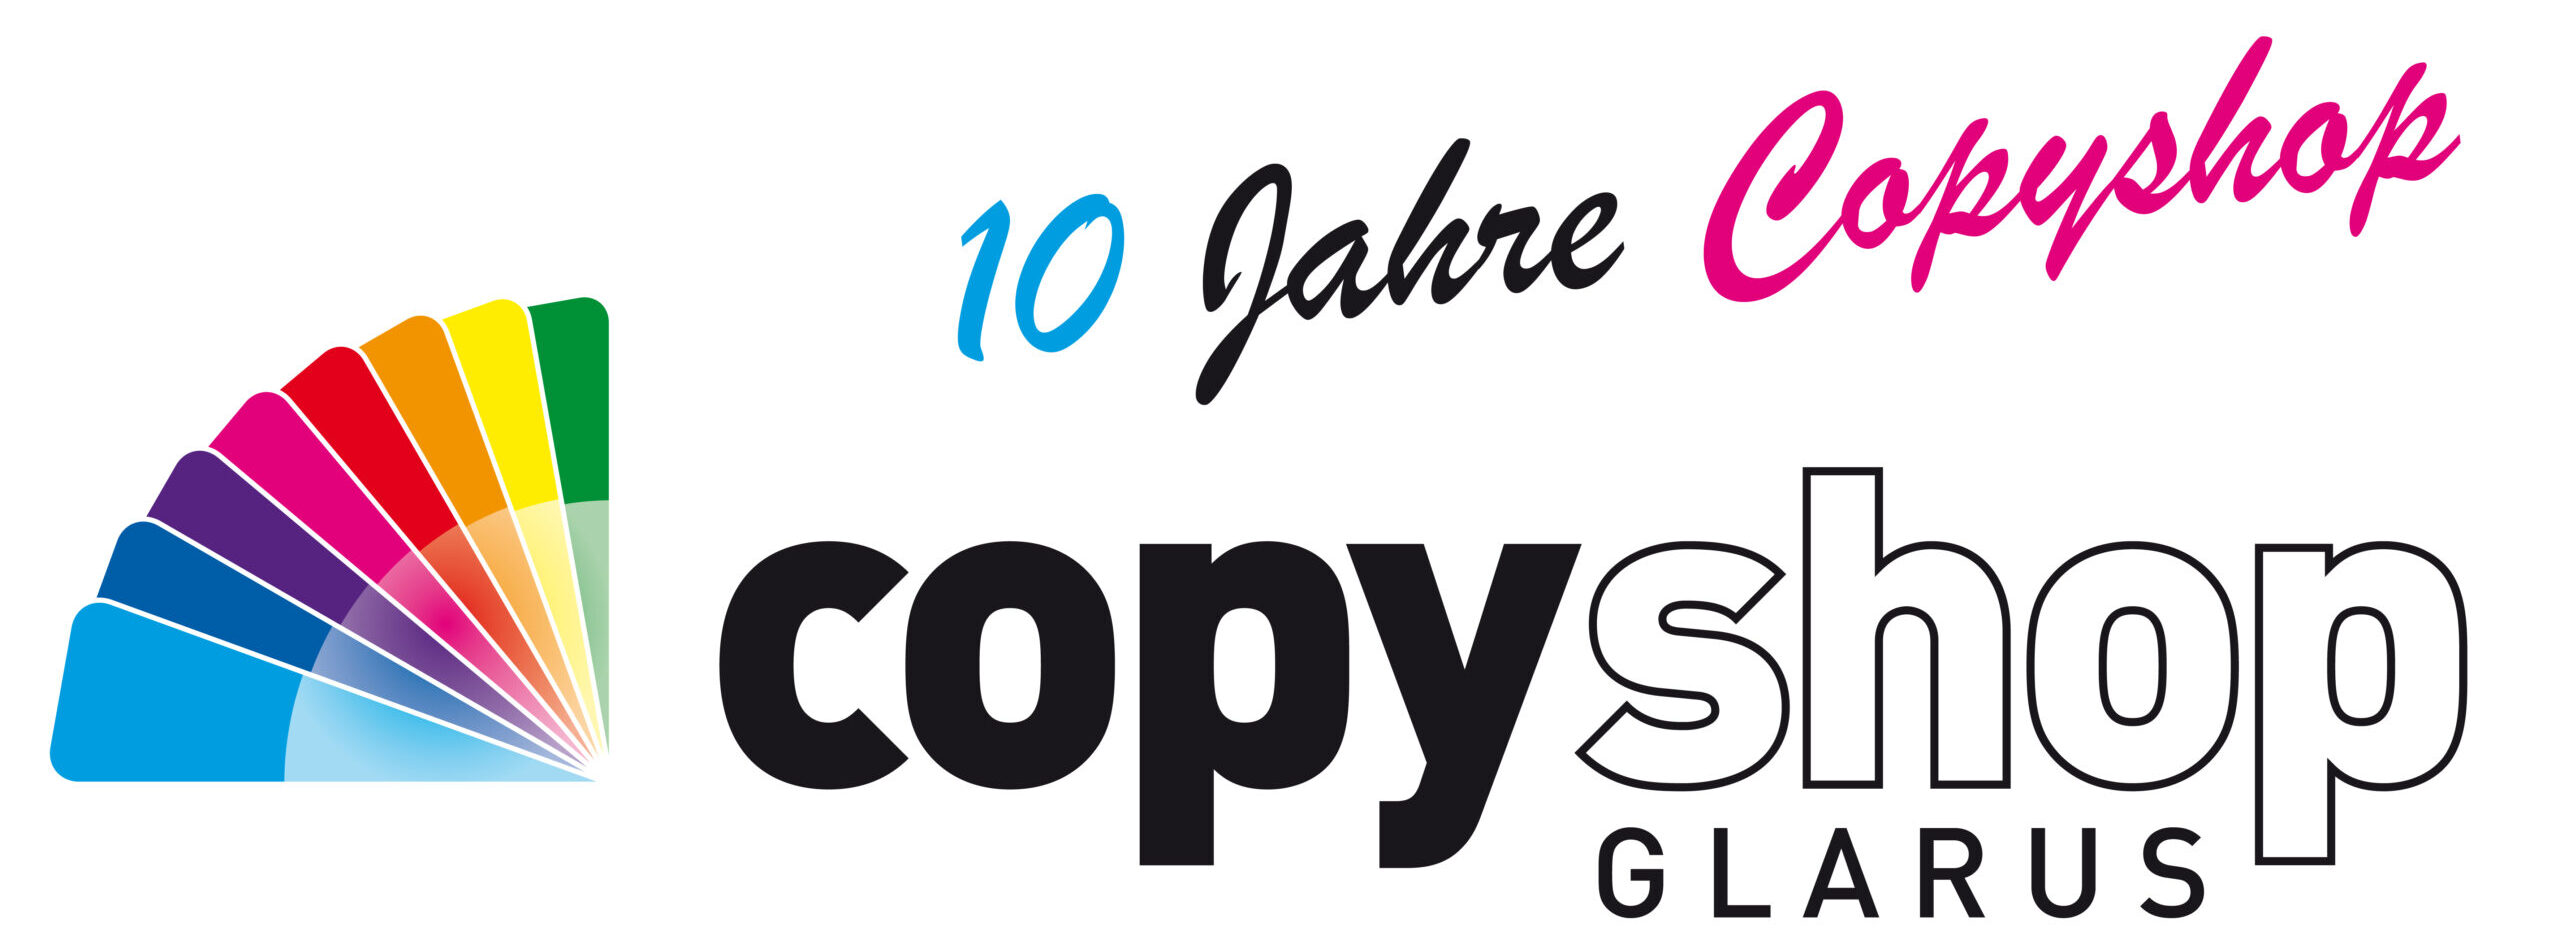 www.copyshop-glarus.ch